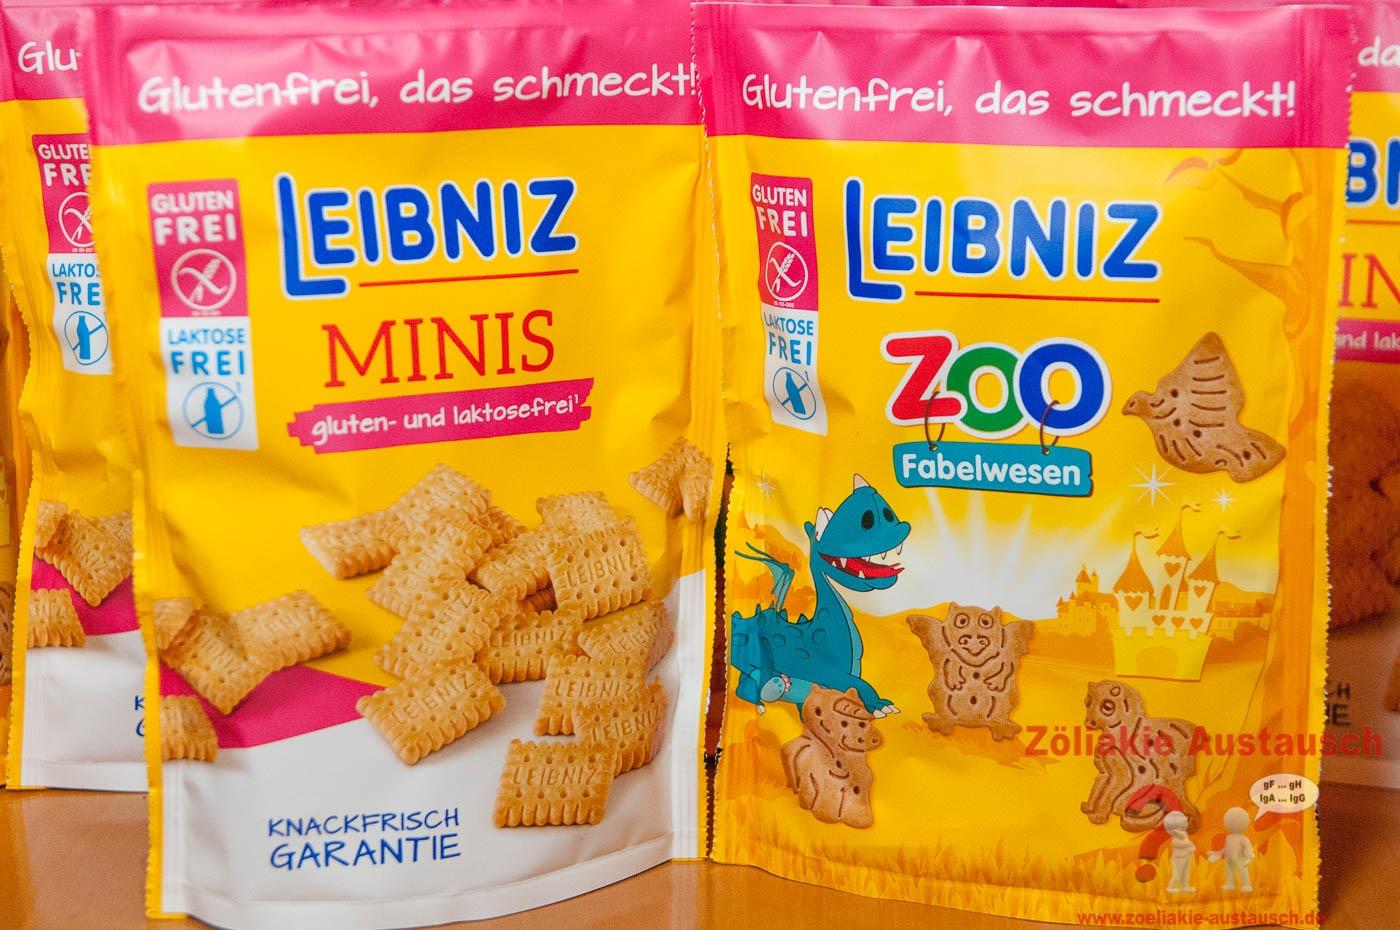 Zoeliakie_Austausch_Leibniz_Kekse-001